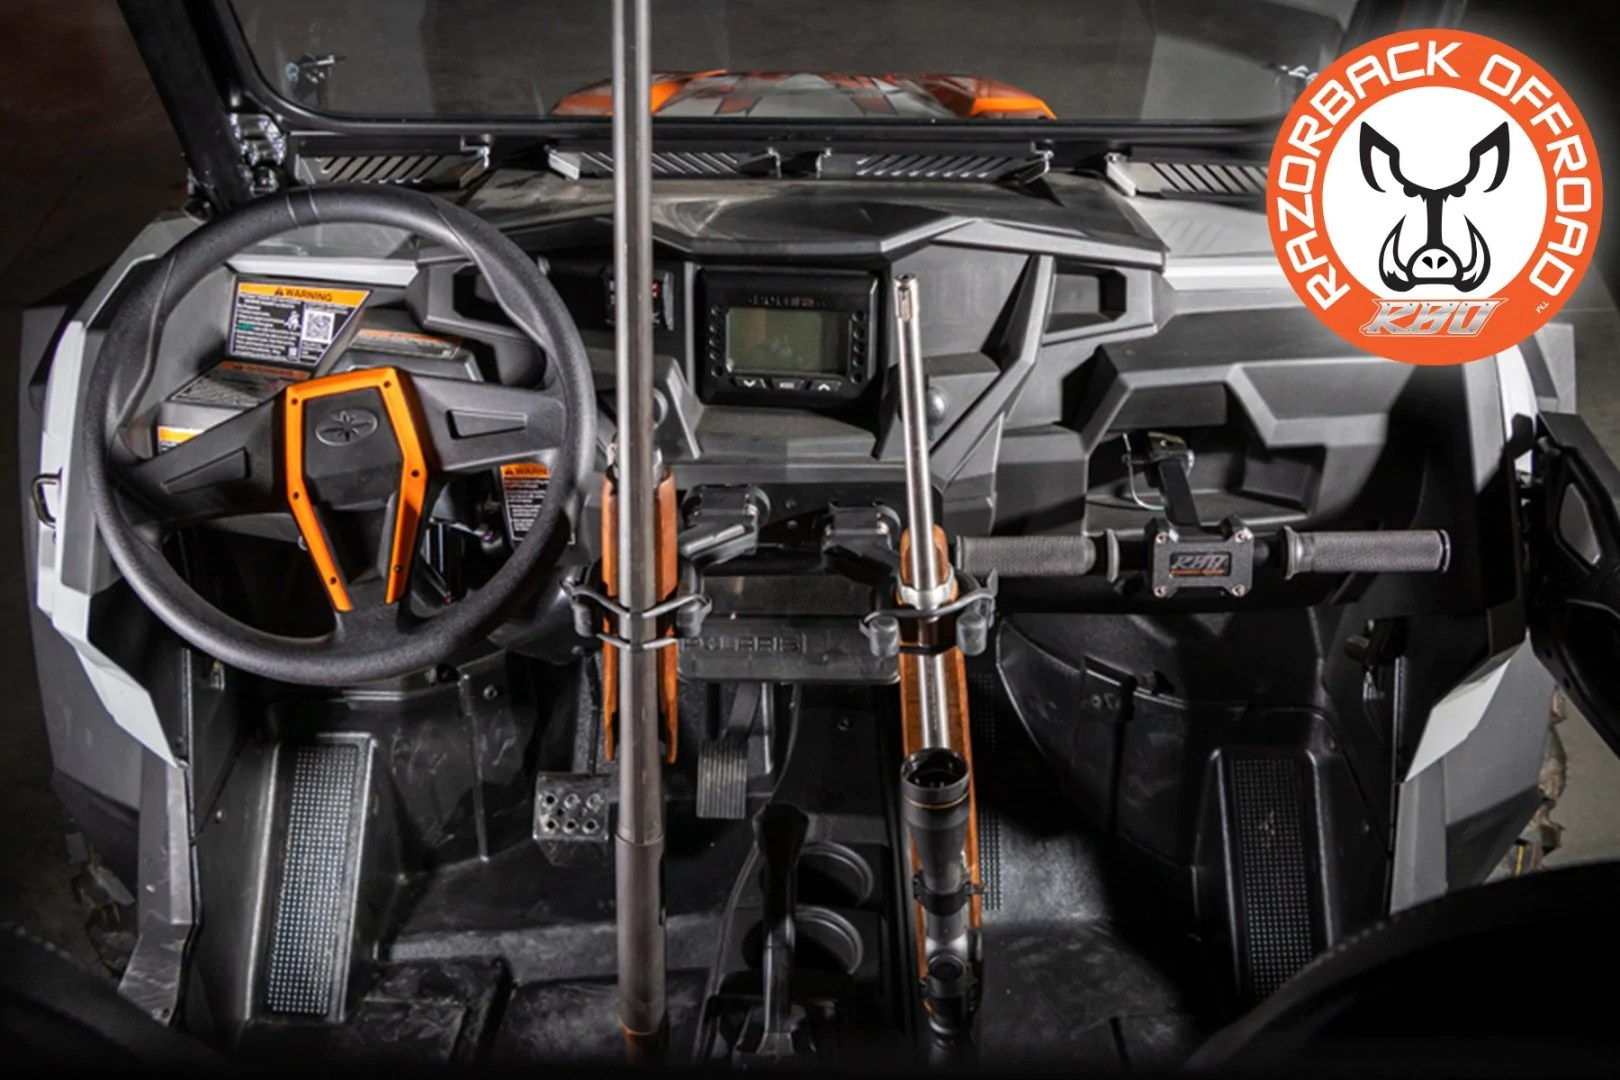 polaris rzr ultimate gun rack grab handle lug wrench by razorback offroad